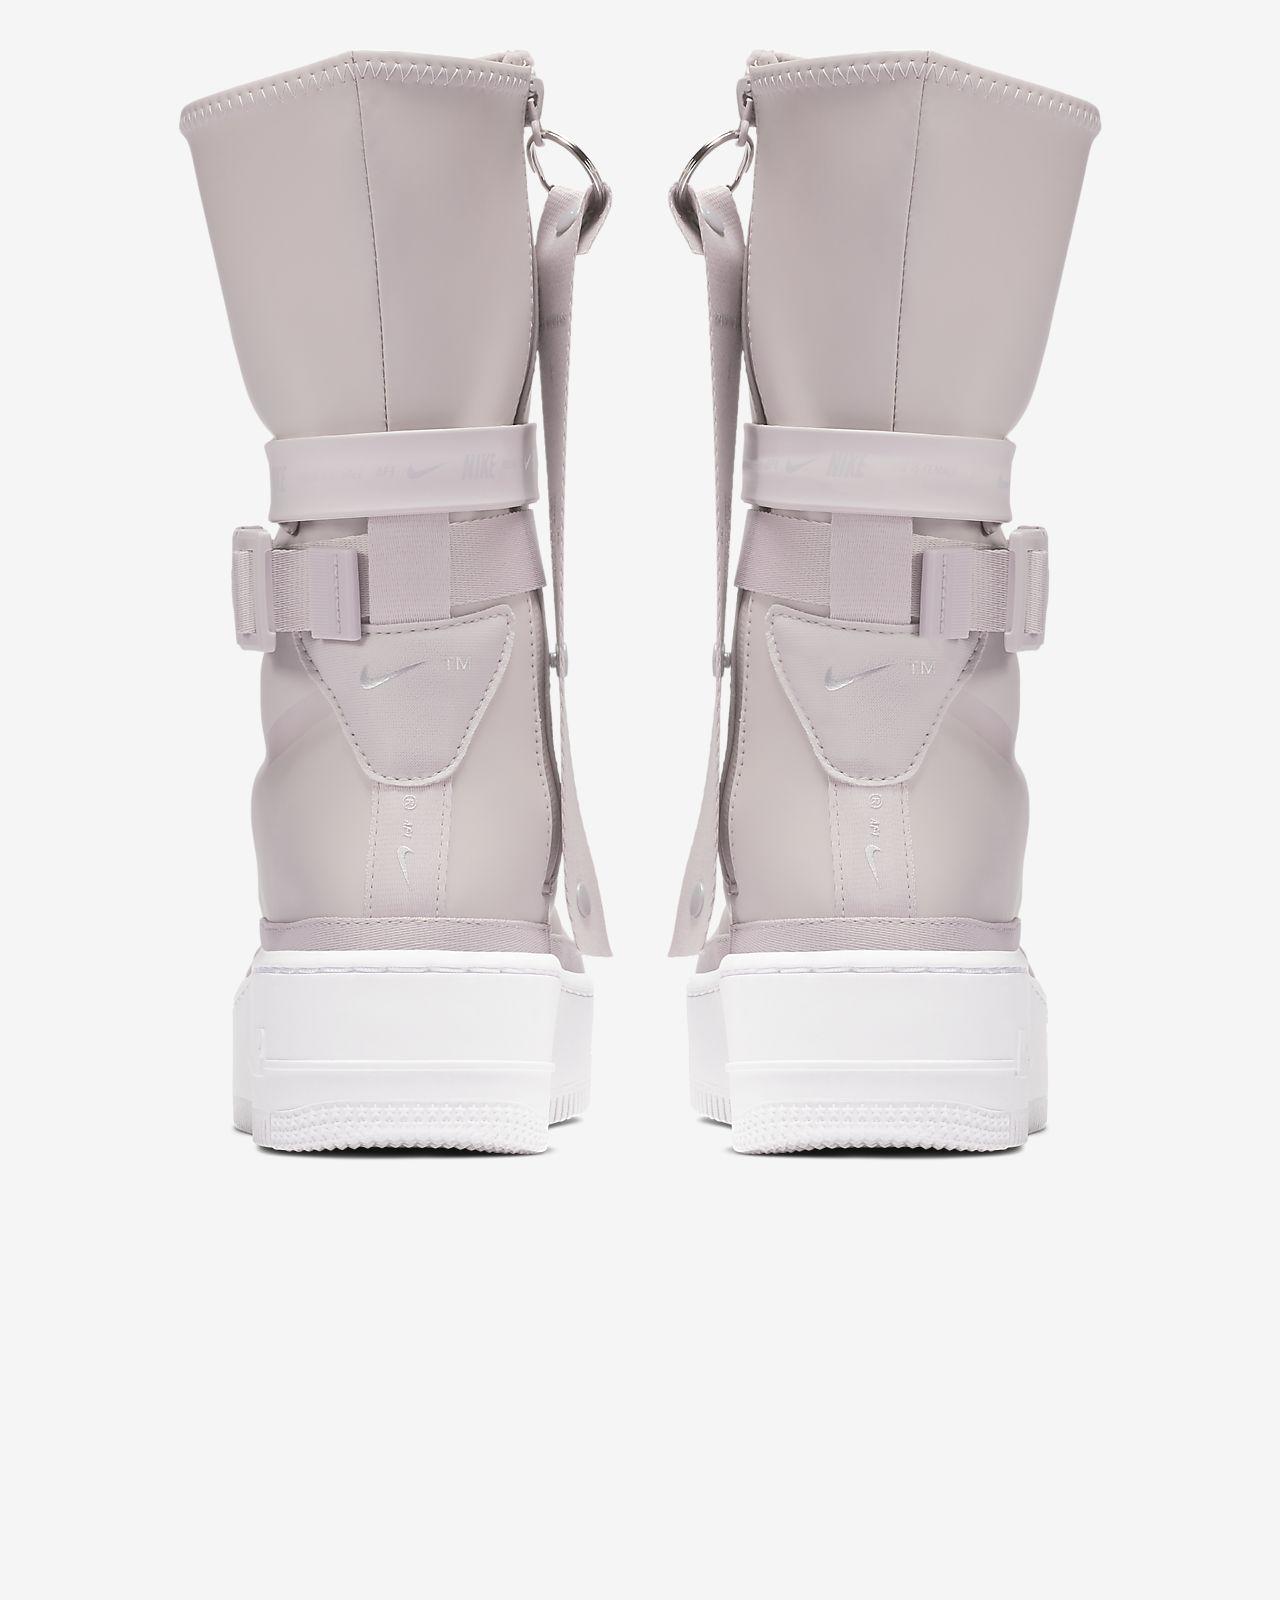 finest selection 9d5c0 0e775 ... Sko Nike Air Force 1 Sage High för kvinnor